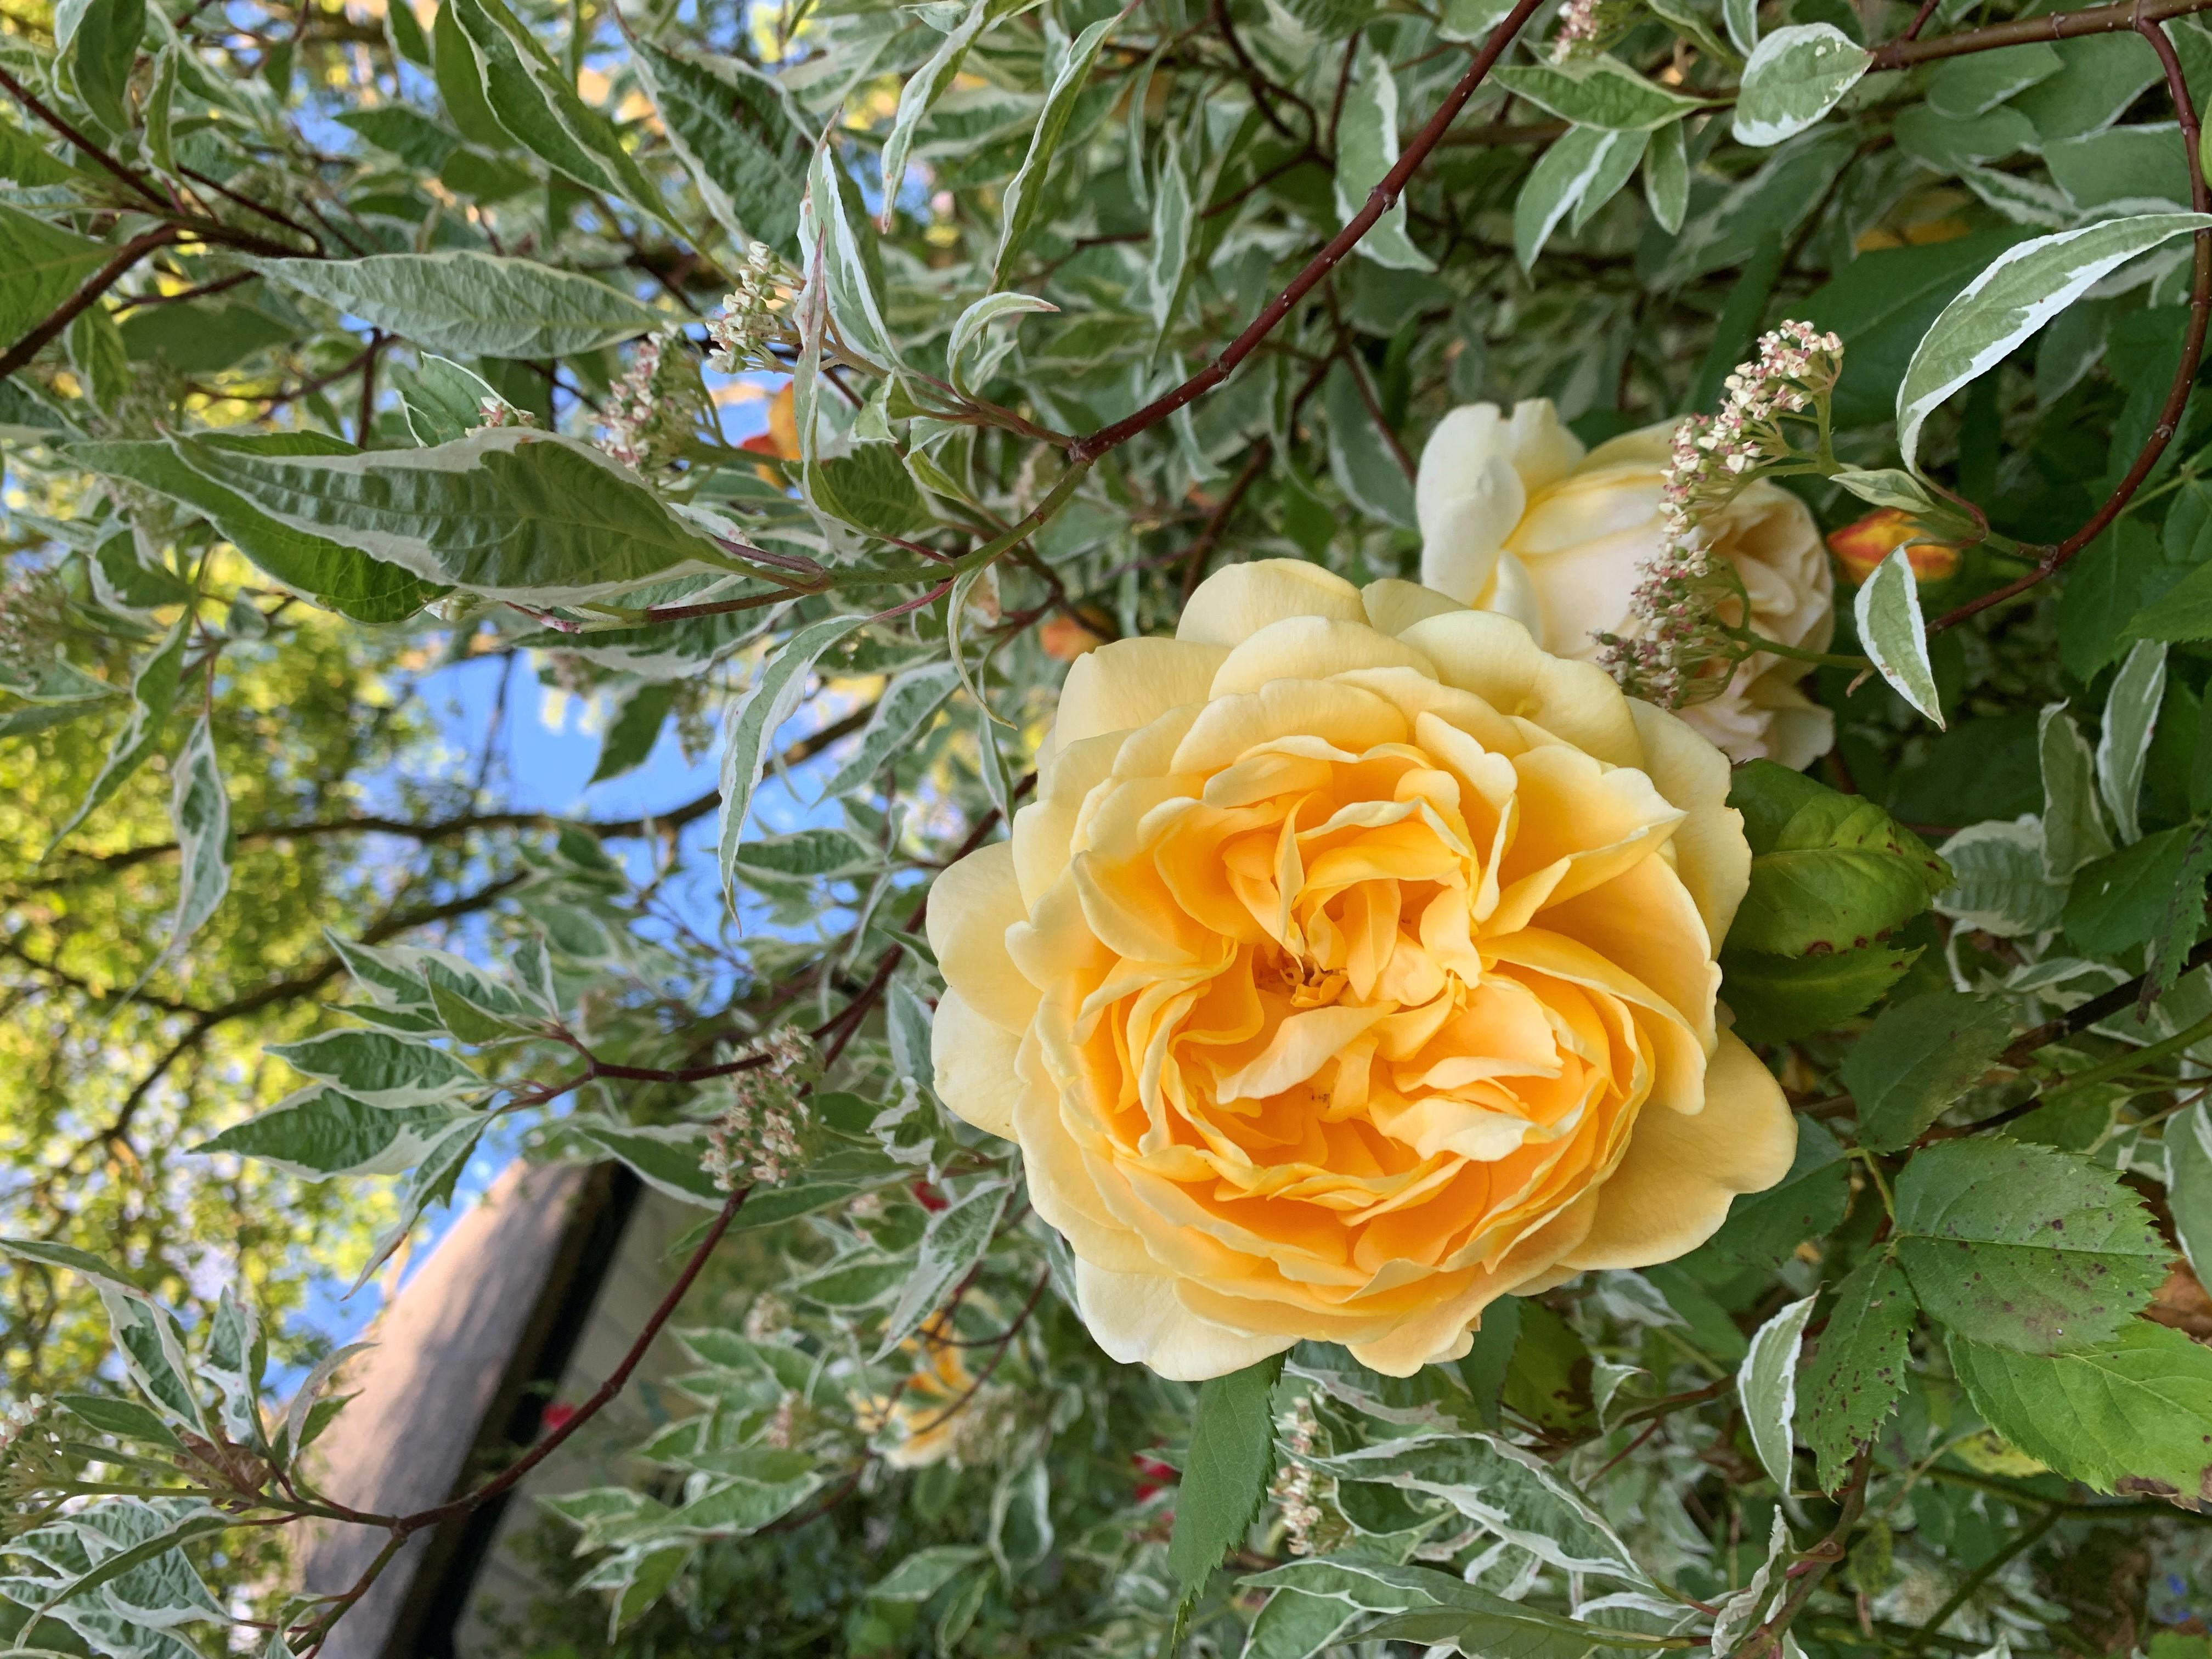 Princess Alexandra's golden celebration rose